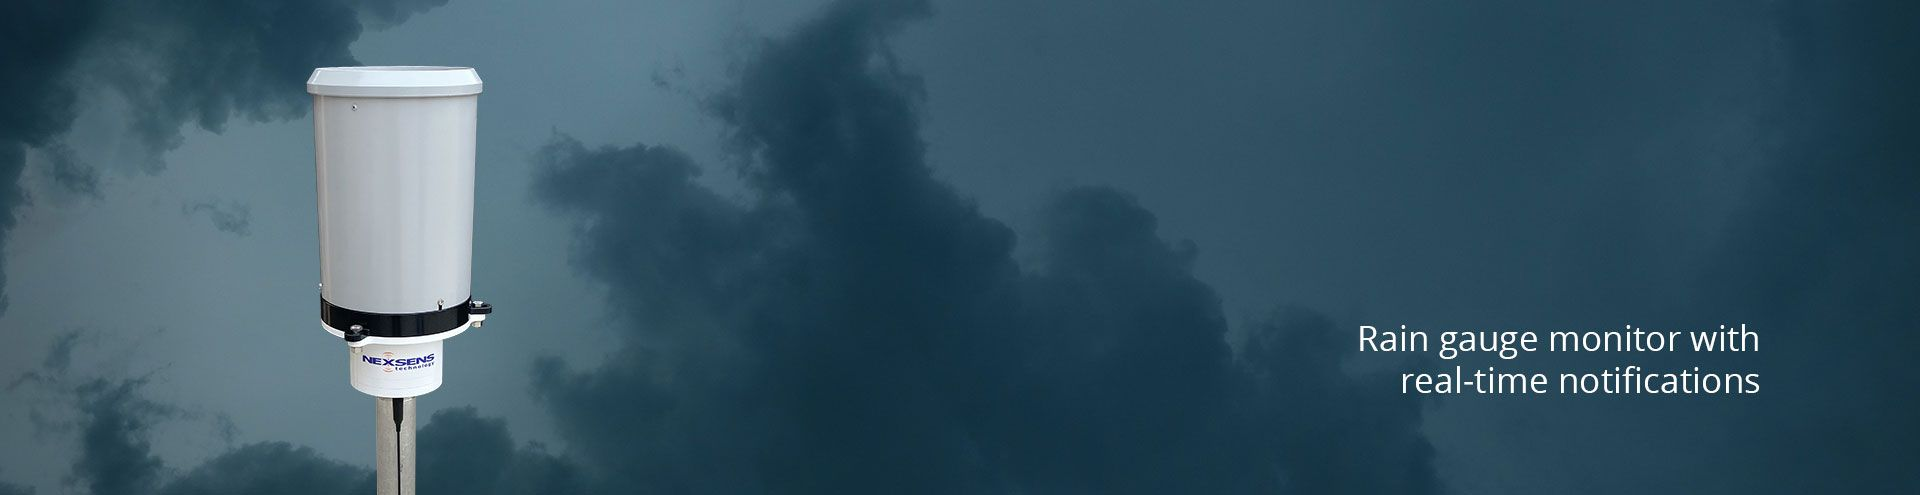 NexSens G2-RAIN Alert System